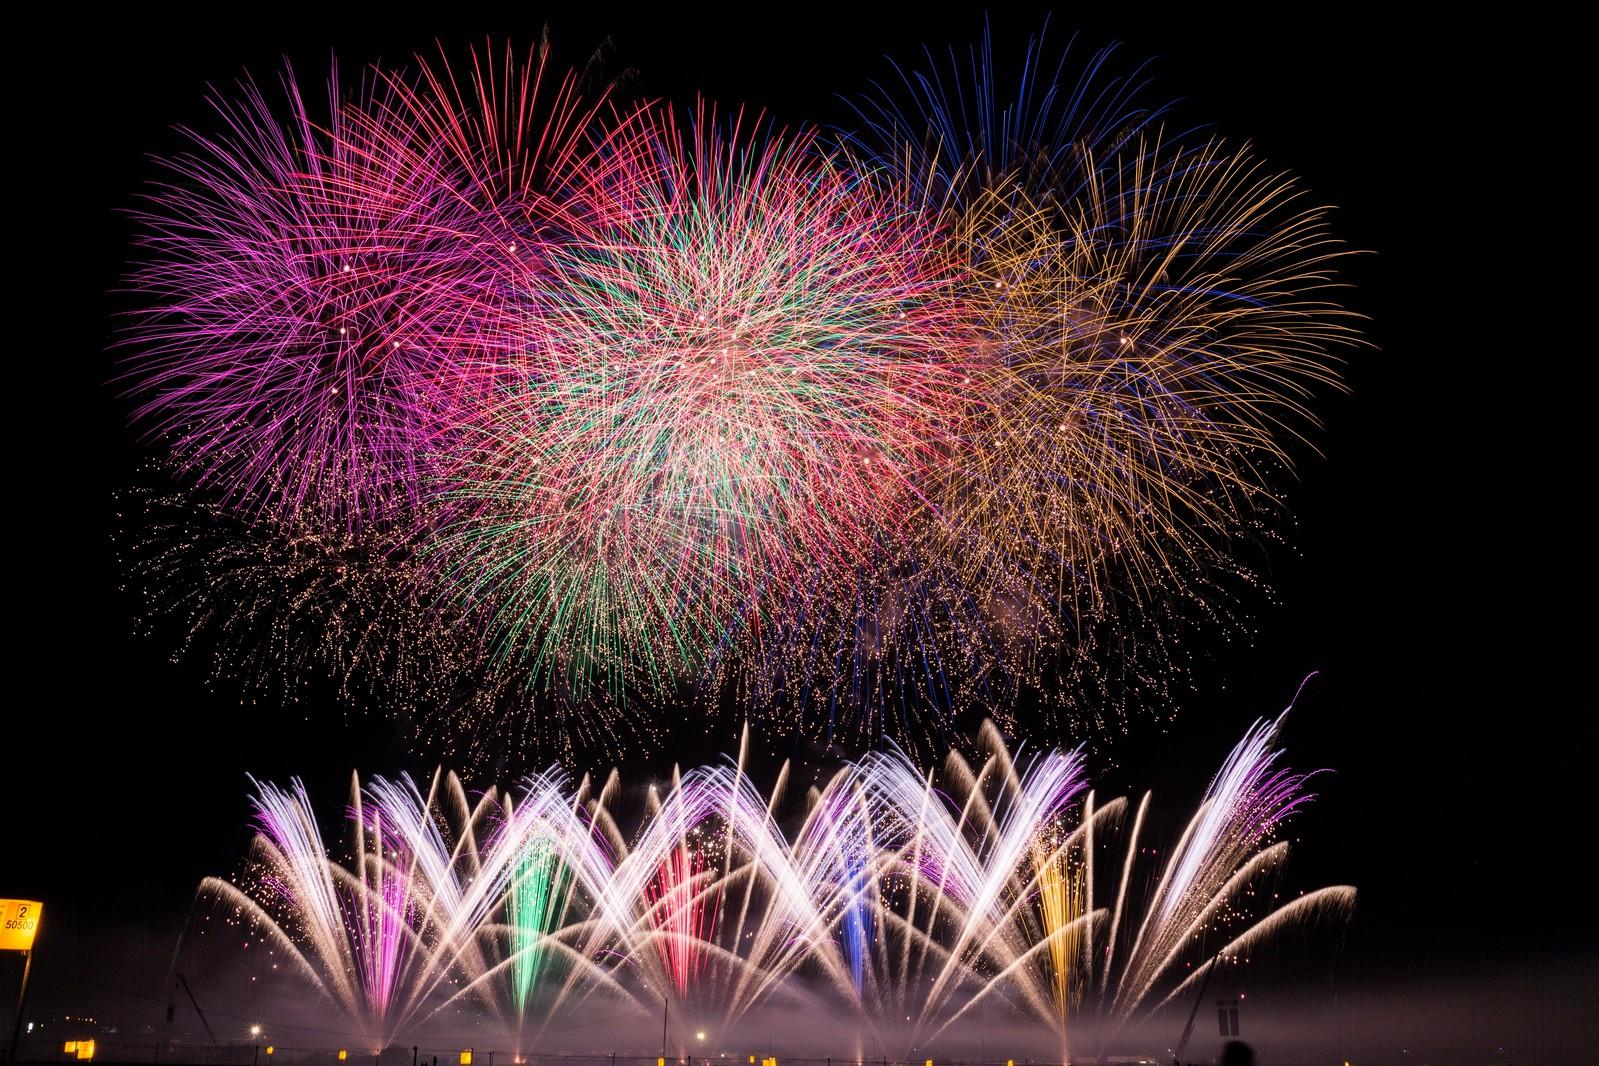 PL花火大会2019穴場や有料観覧場所と最寄駅!日程時間と混雑状況や終電